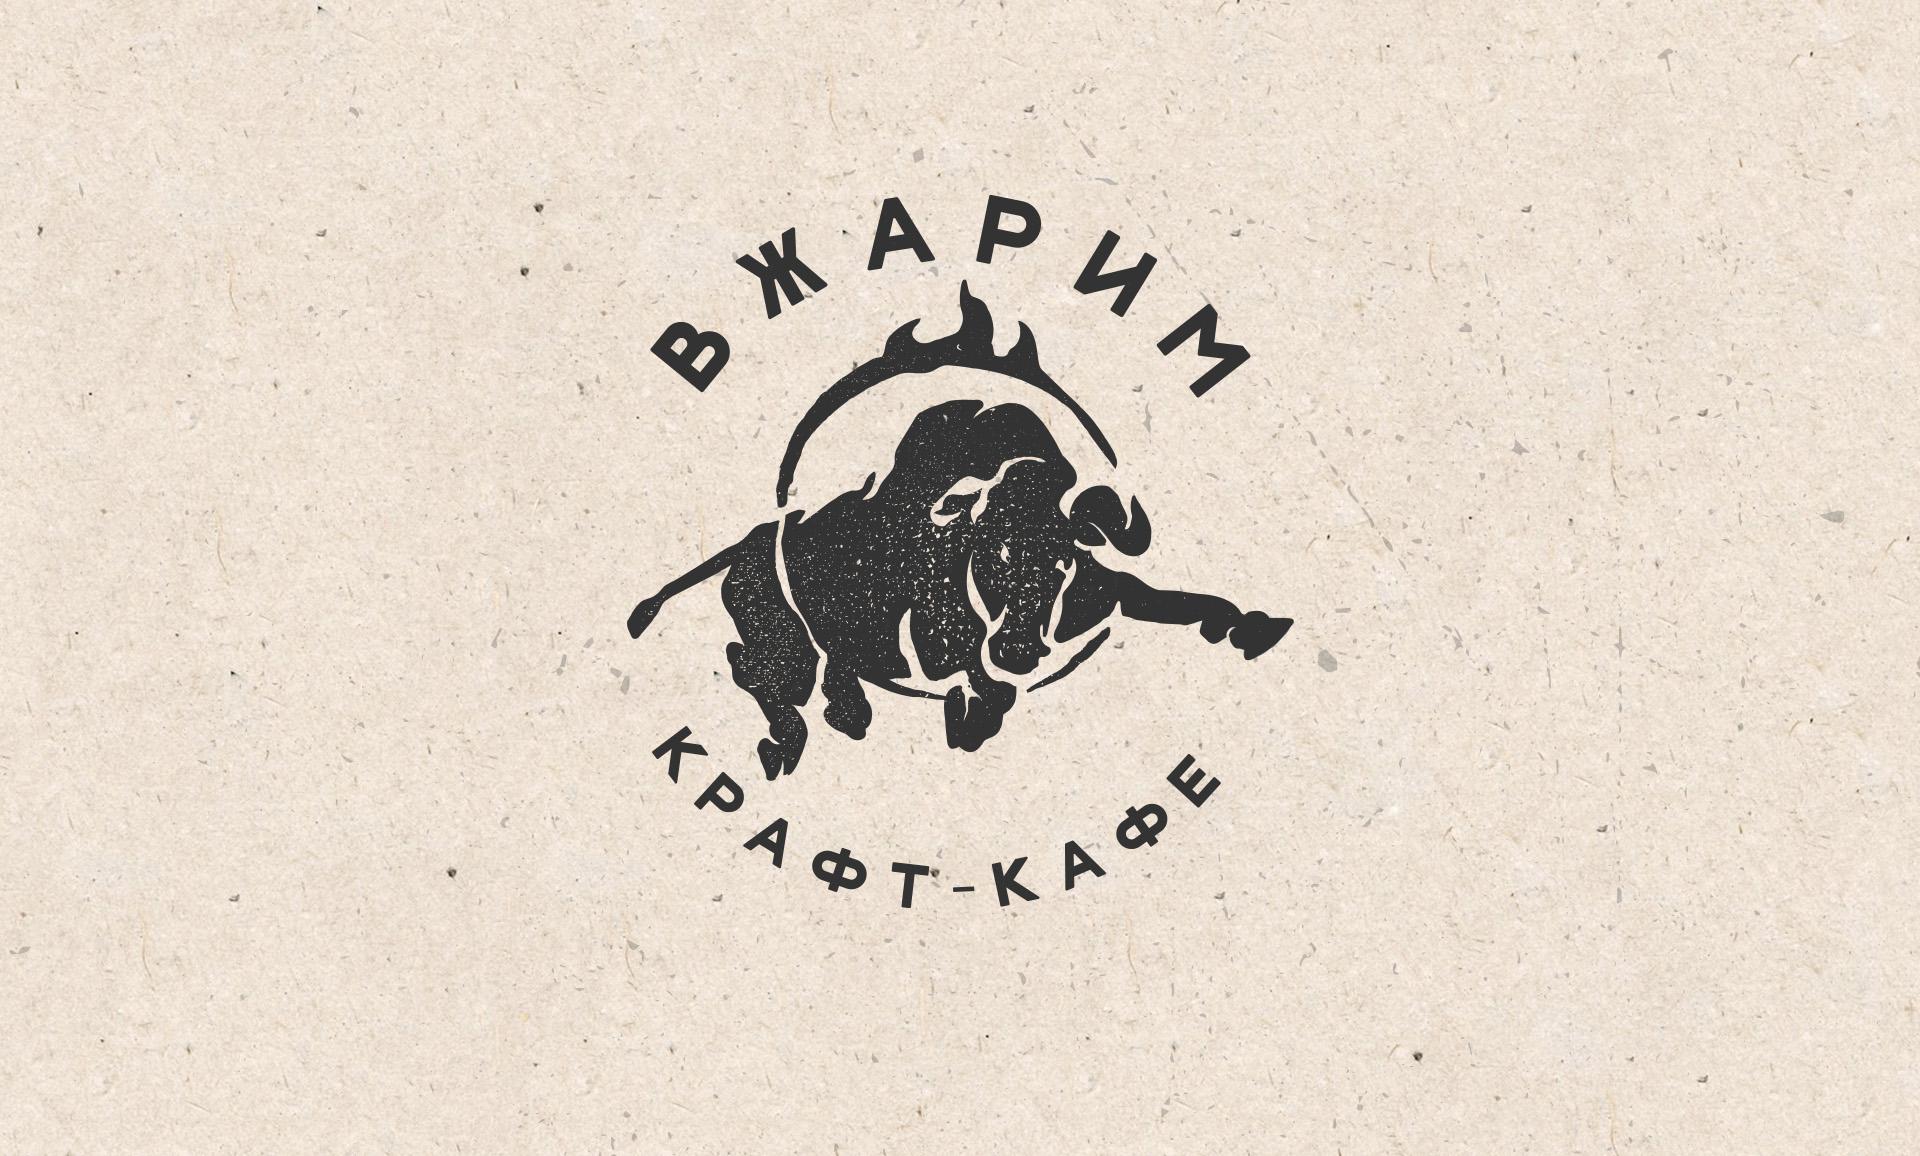 Требуется, разработка логотипа для крафт-кафе «ВЖАРИМ». фото f_435600873d83f90e.jpg